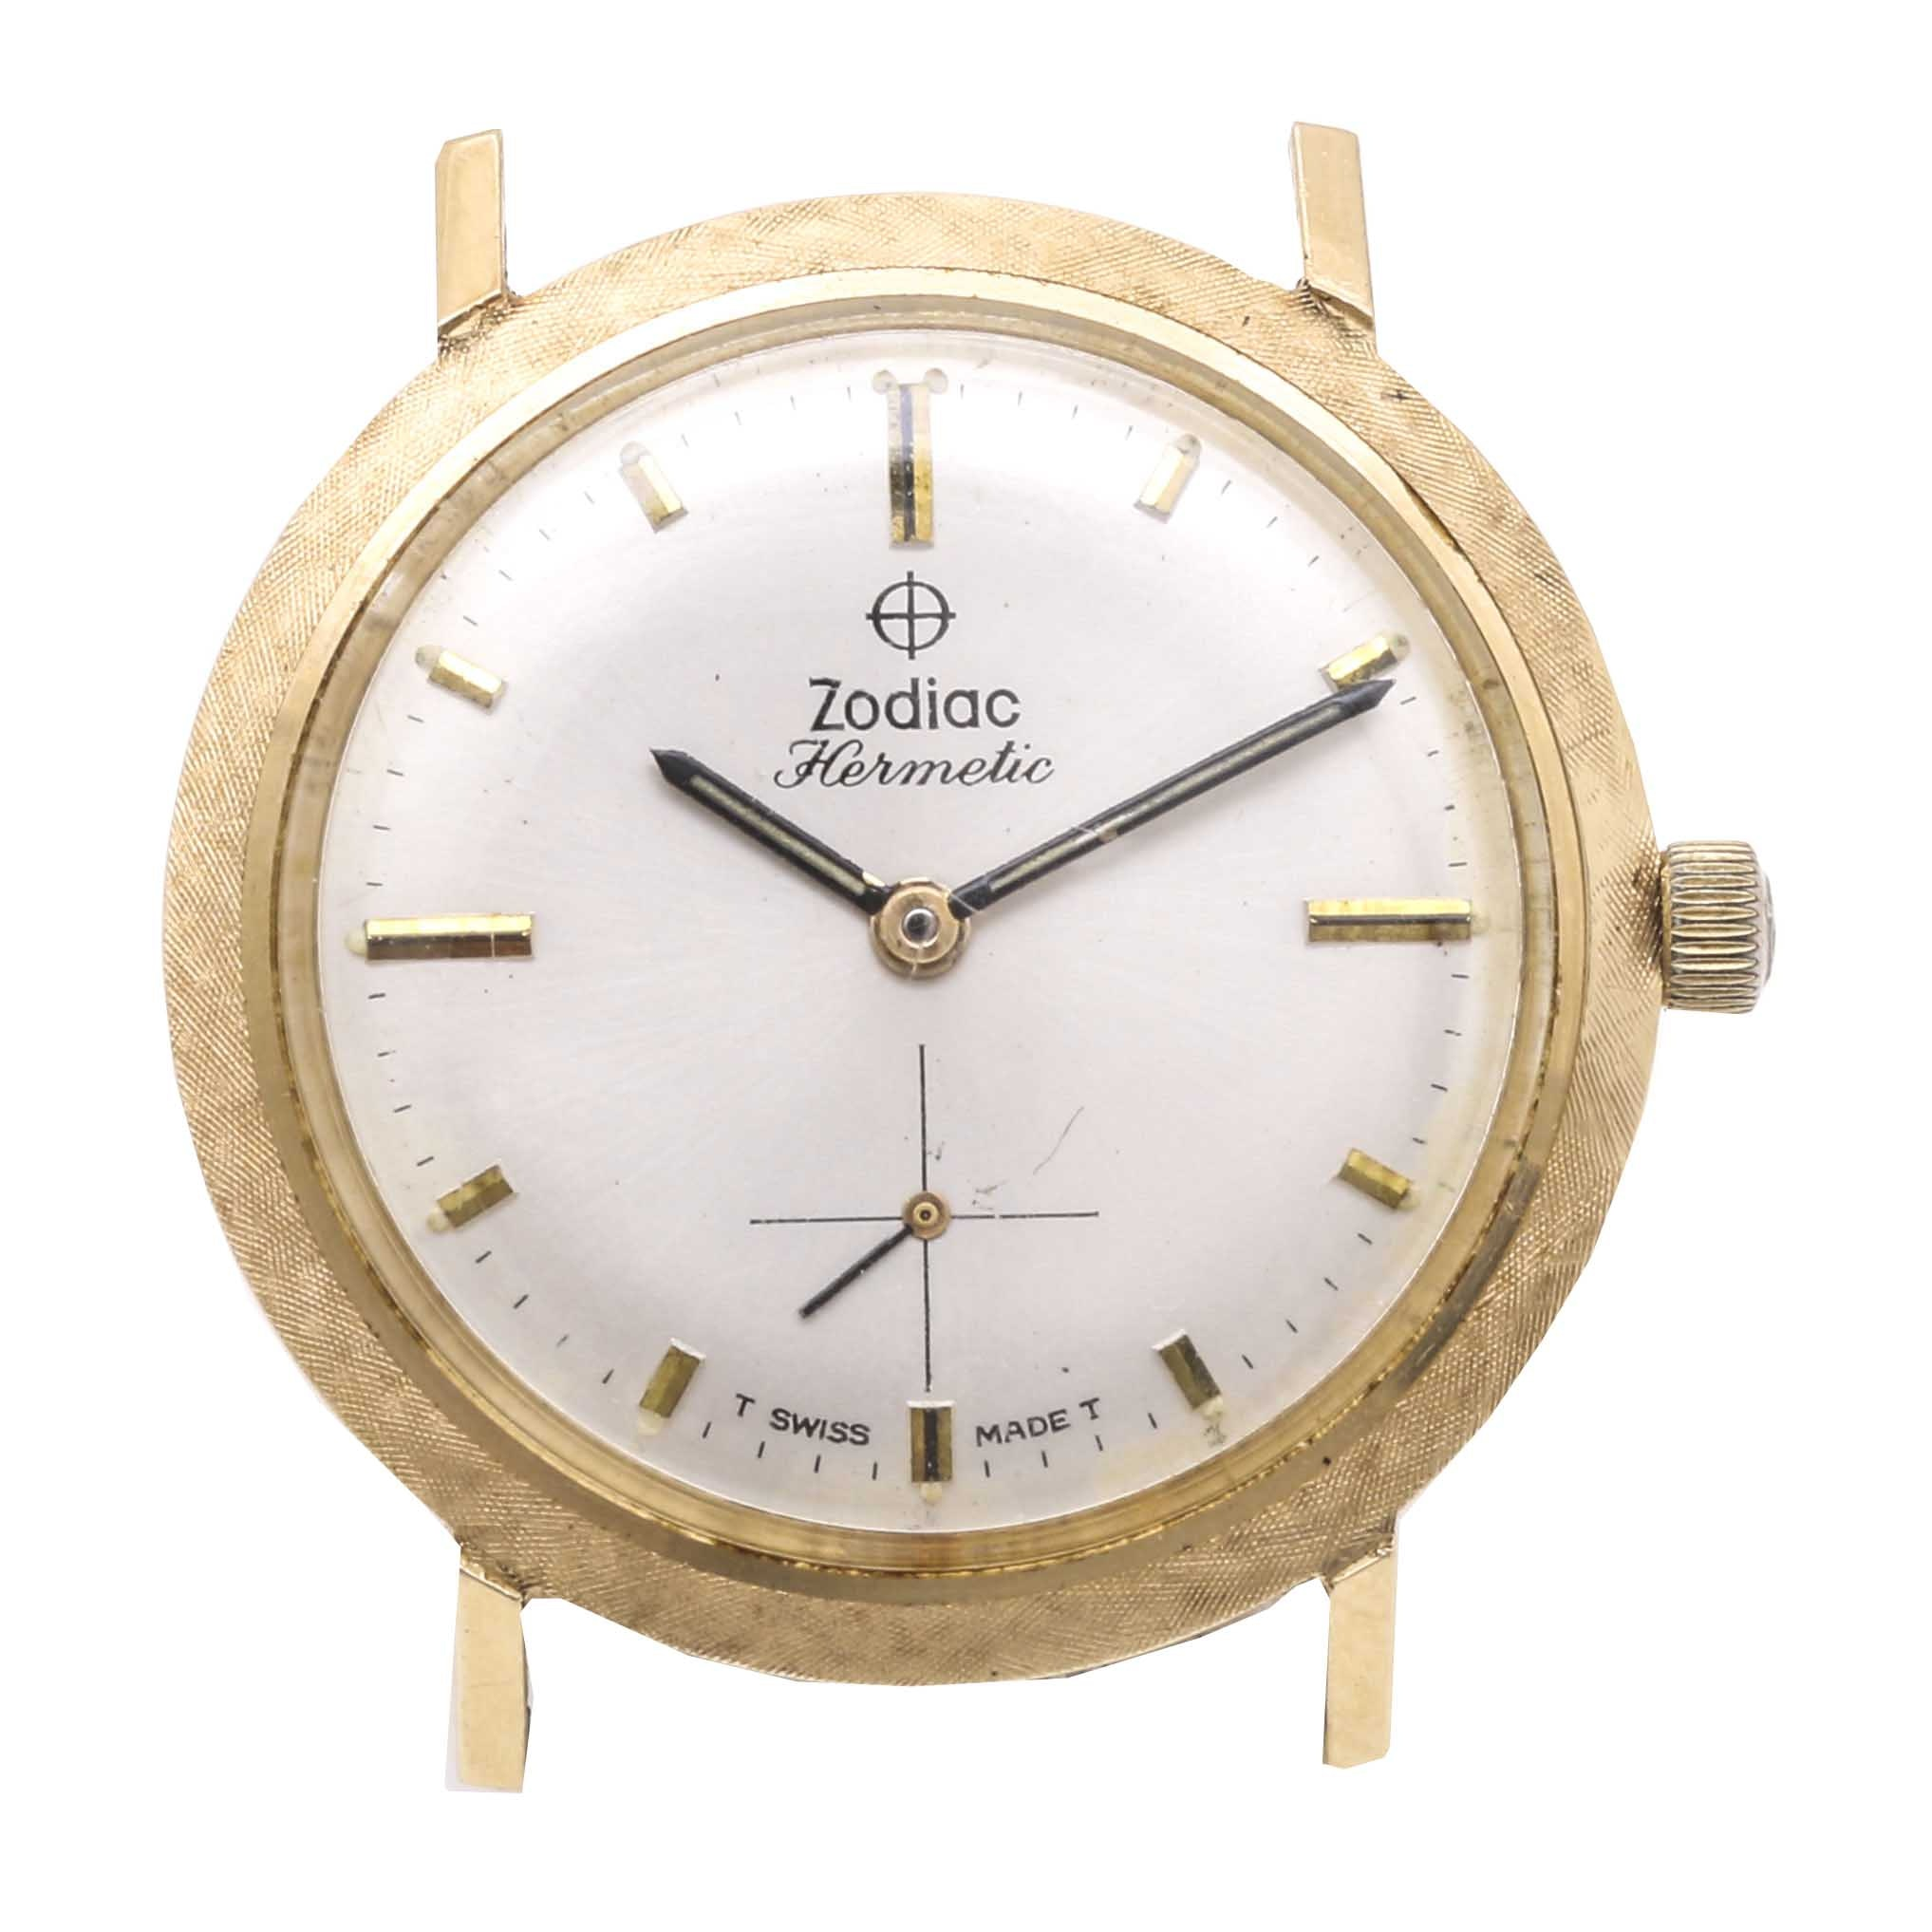 Zodiac Hermetic 14K Yellow Gold Wristwatch